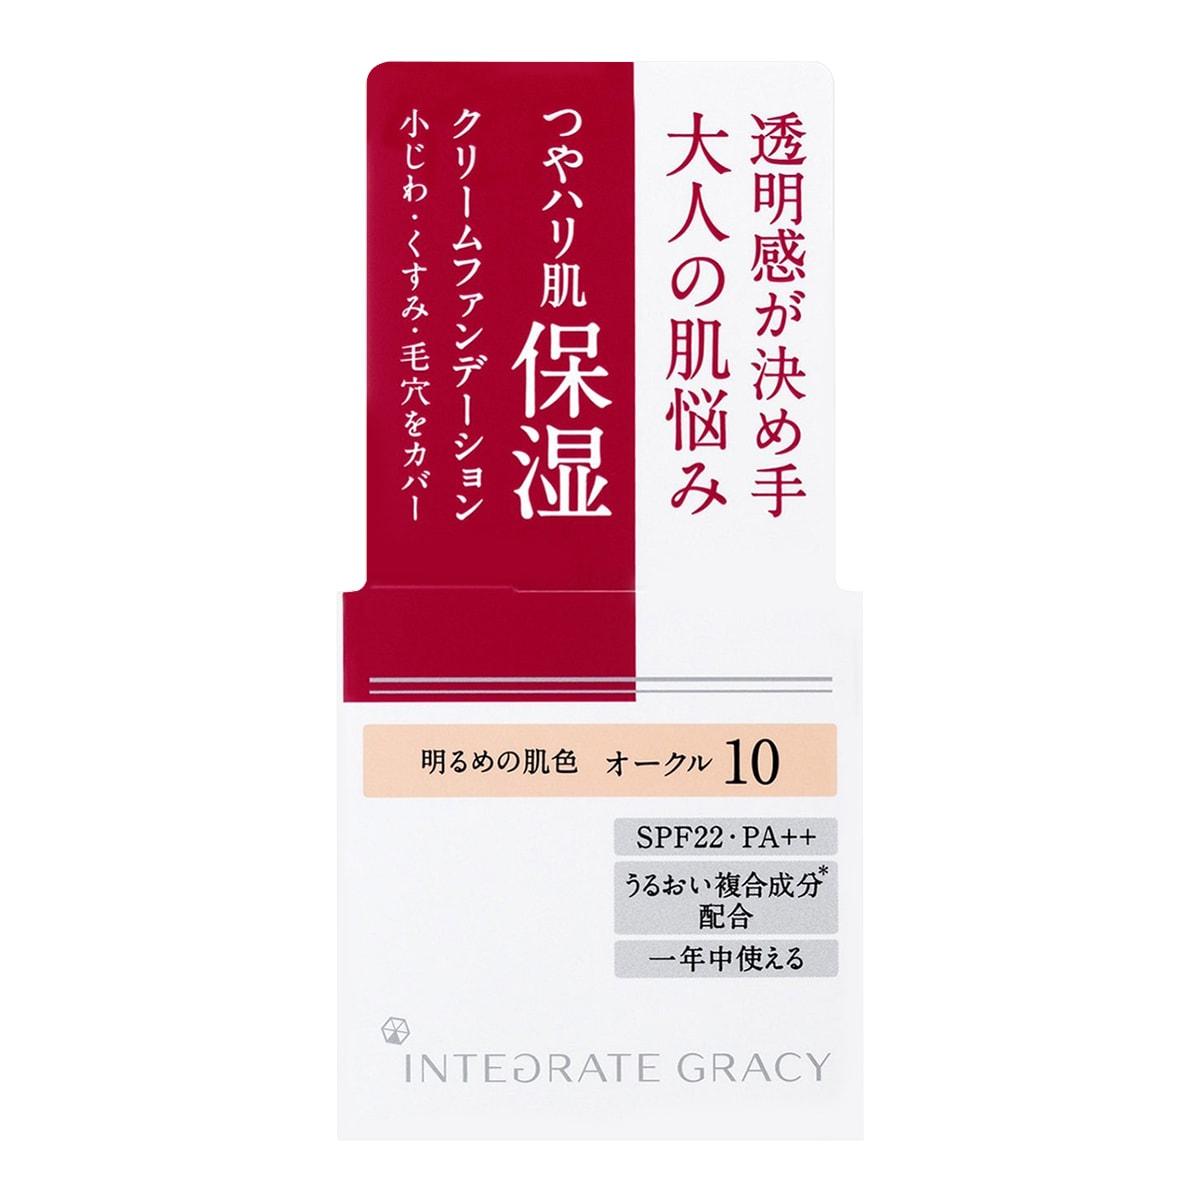 SHISEIDO INTEGRATE GRACY Moist Cream Foundation #OC10